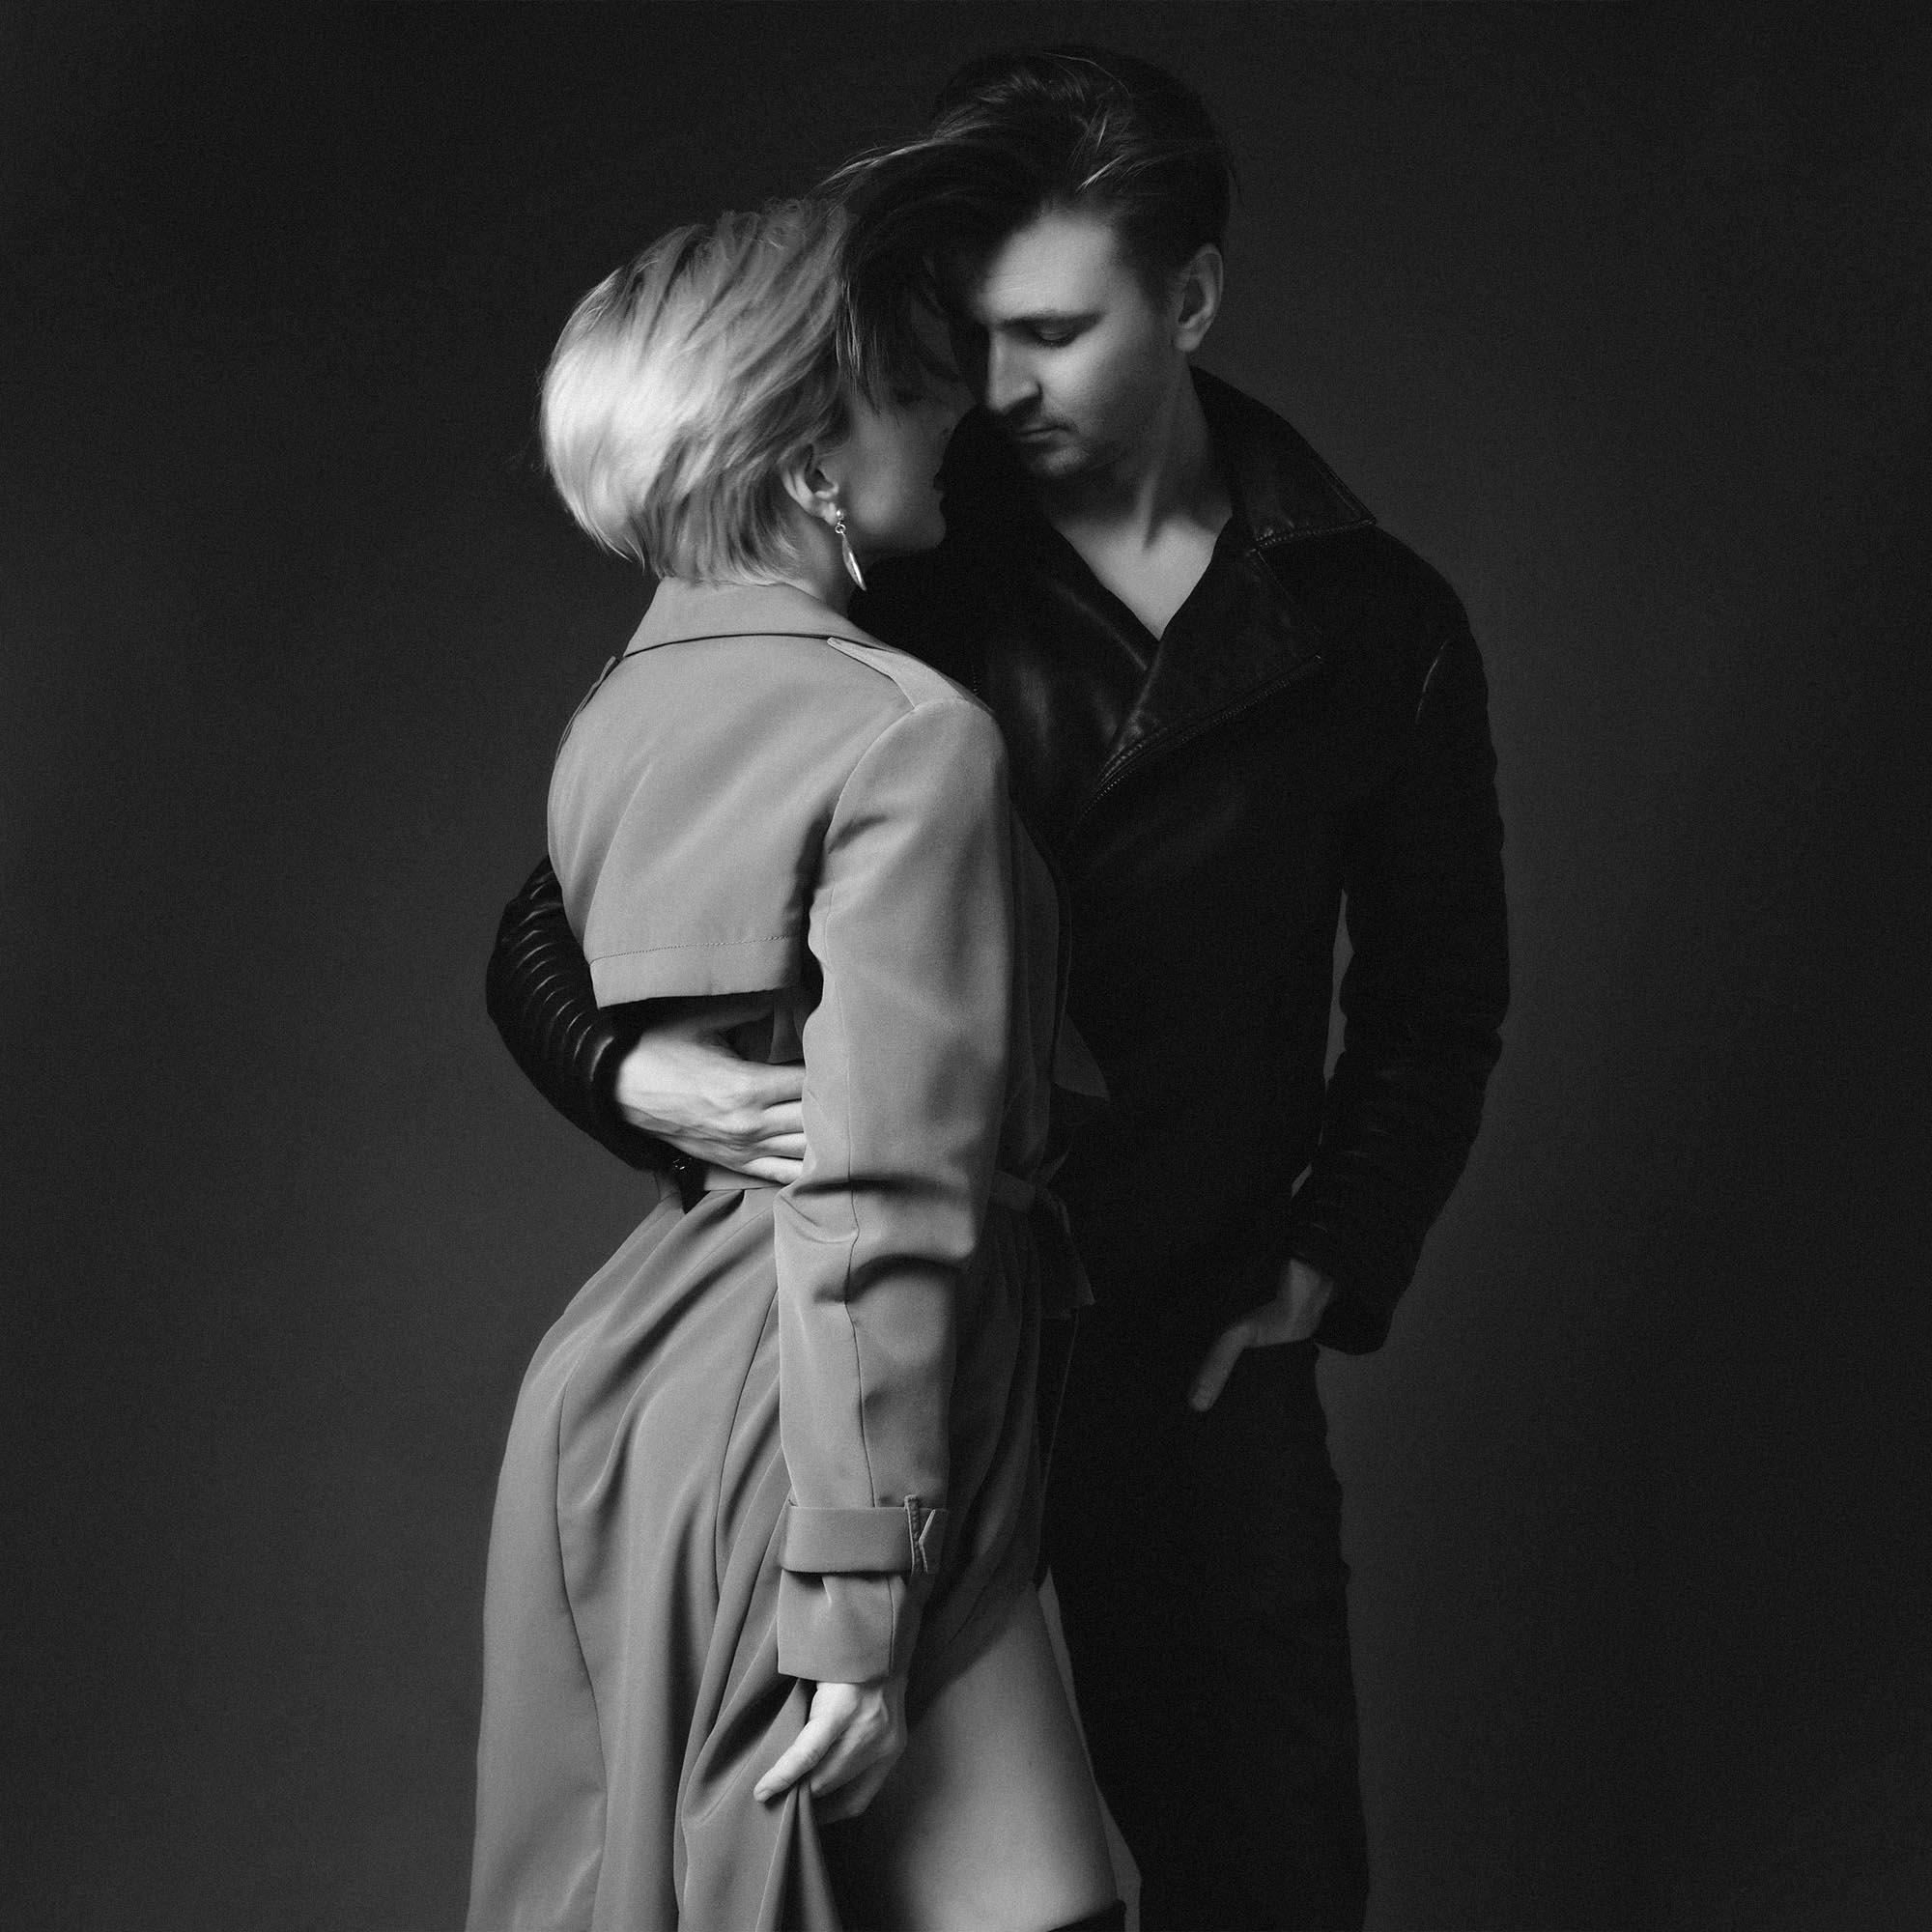 nyc-photographers-Love-Story-Photoshoot-10002.jpg